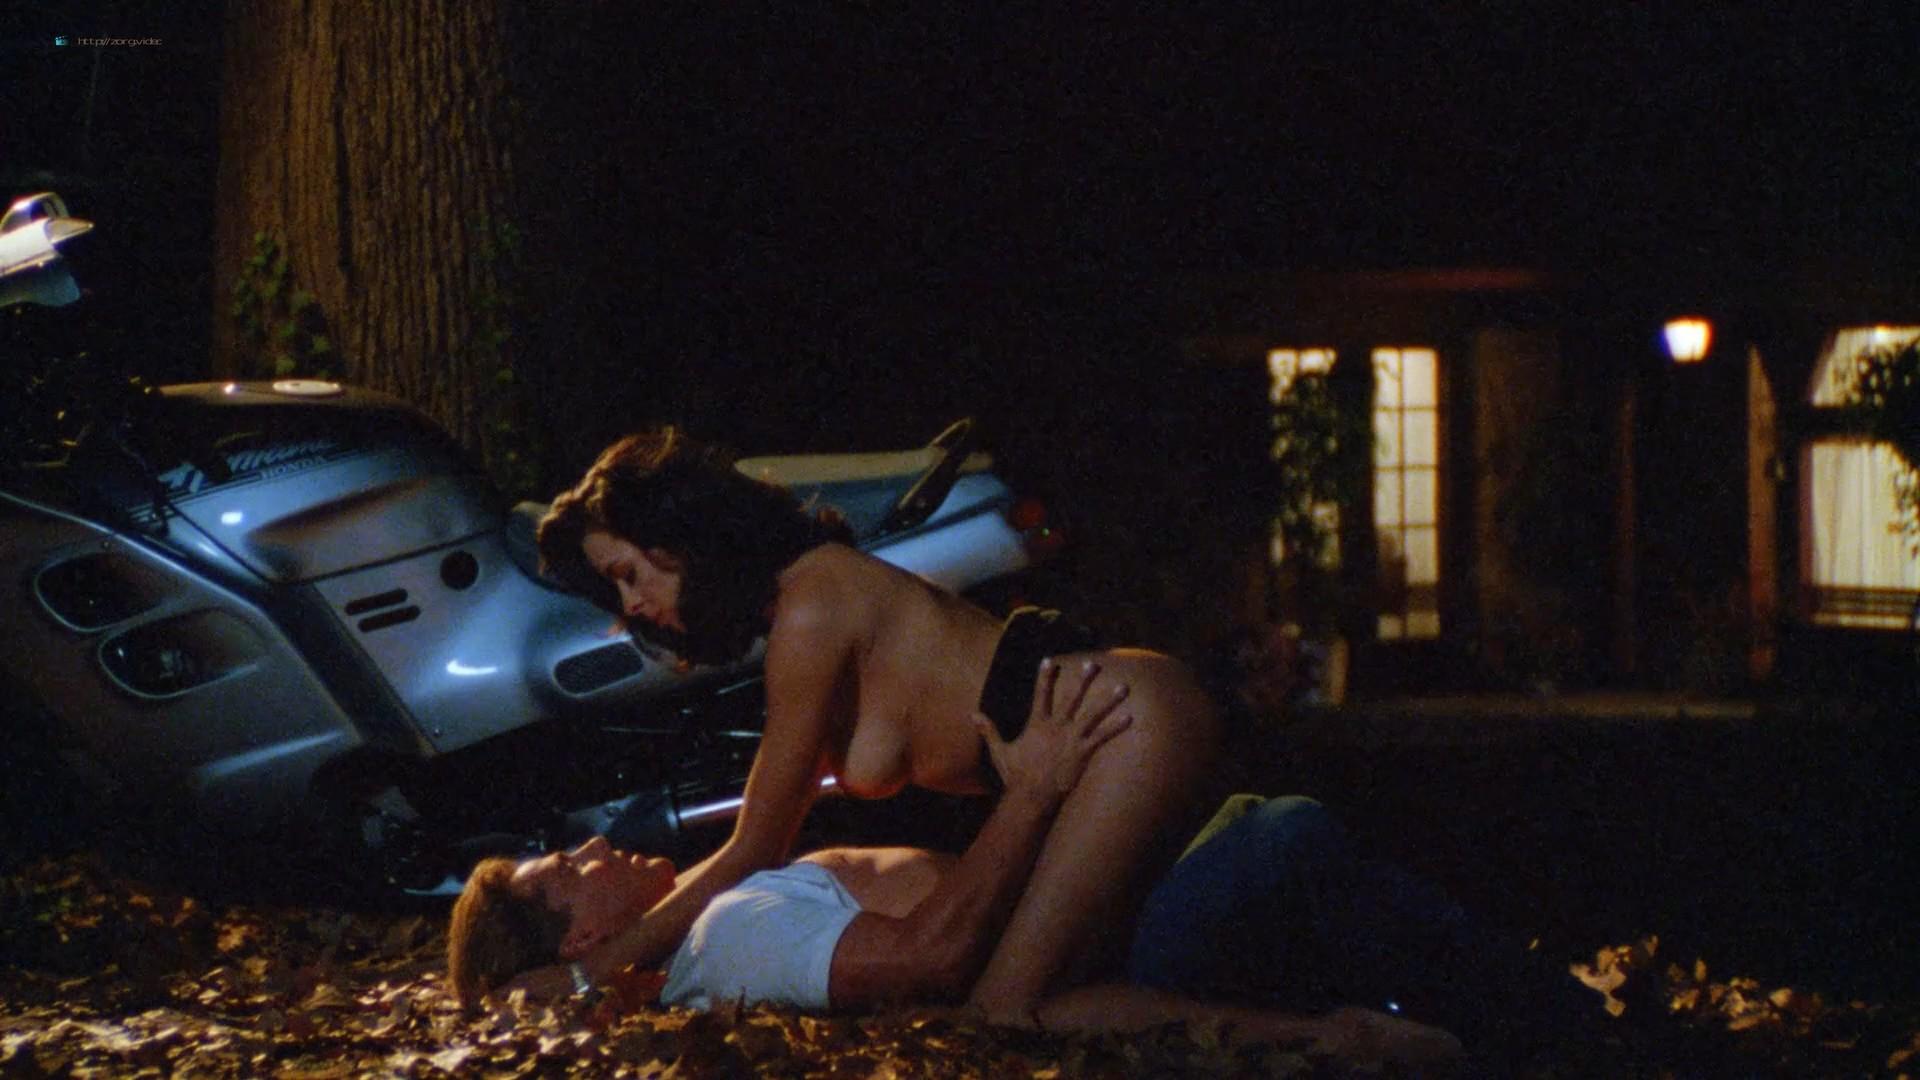 Dona Speir nude Pandora Peaks, Carolyn Liu and others nude too - Do or Die (1991) 1080p BluRay (12)